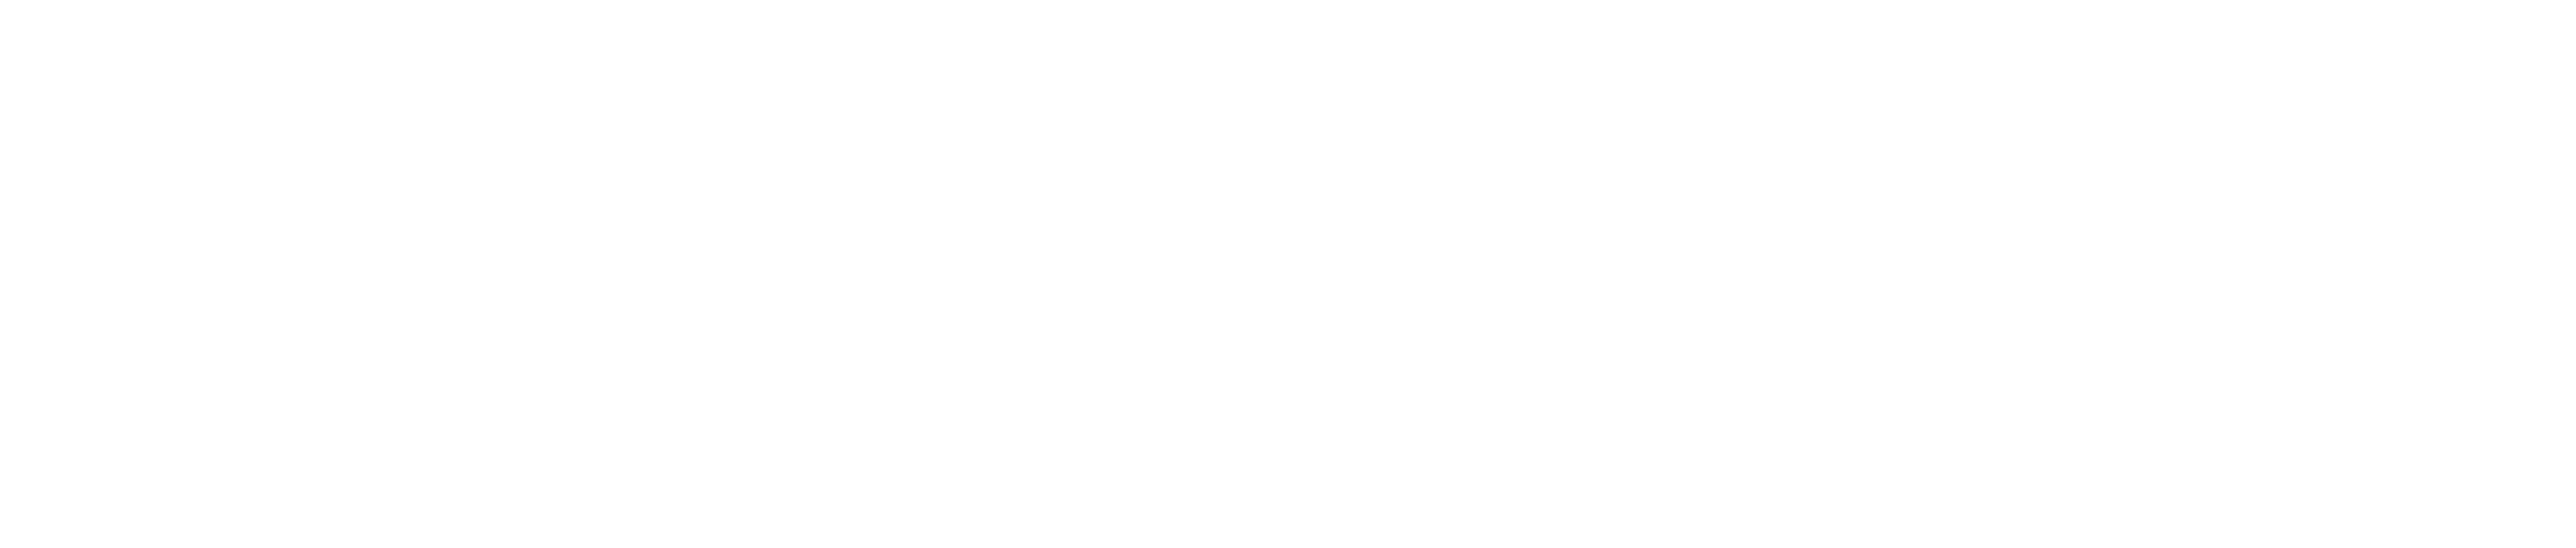 Latitude Blockchain Services